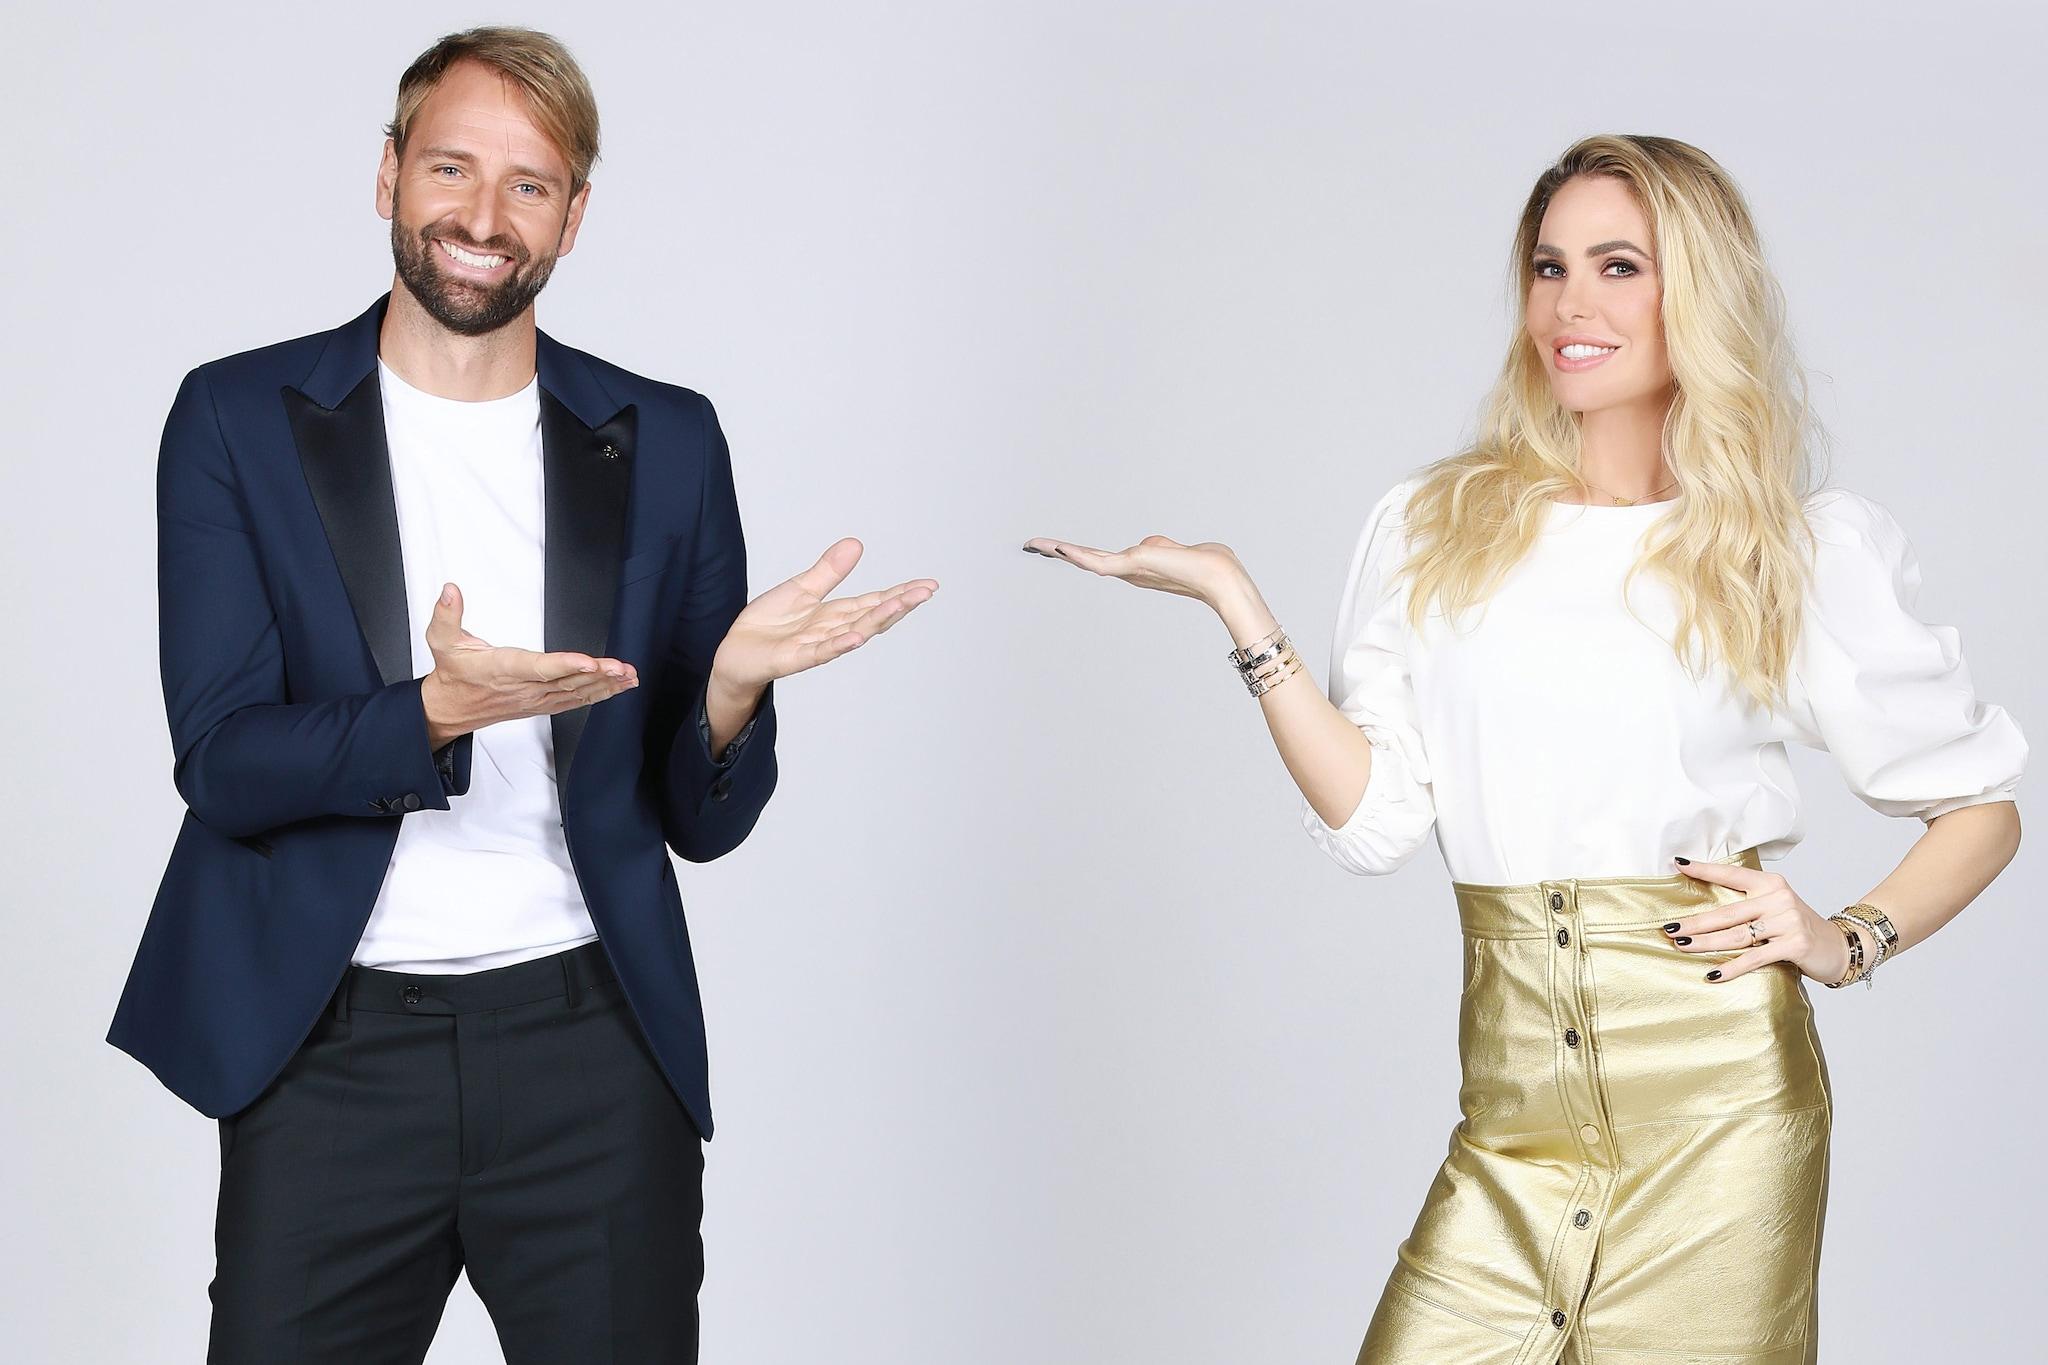 Massimiliano Rosolino e Ilary Blasi all'Isola dei famosi 2021